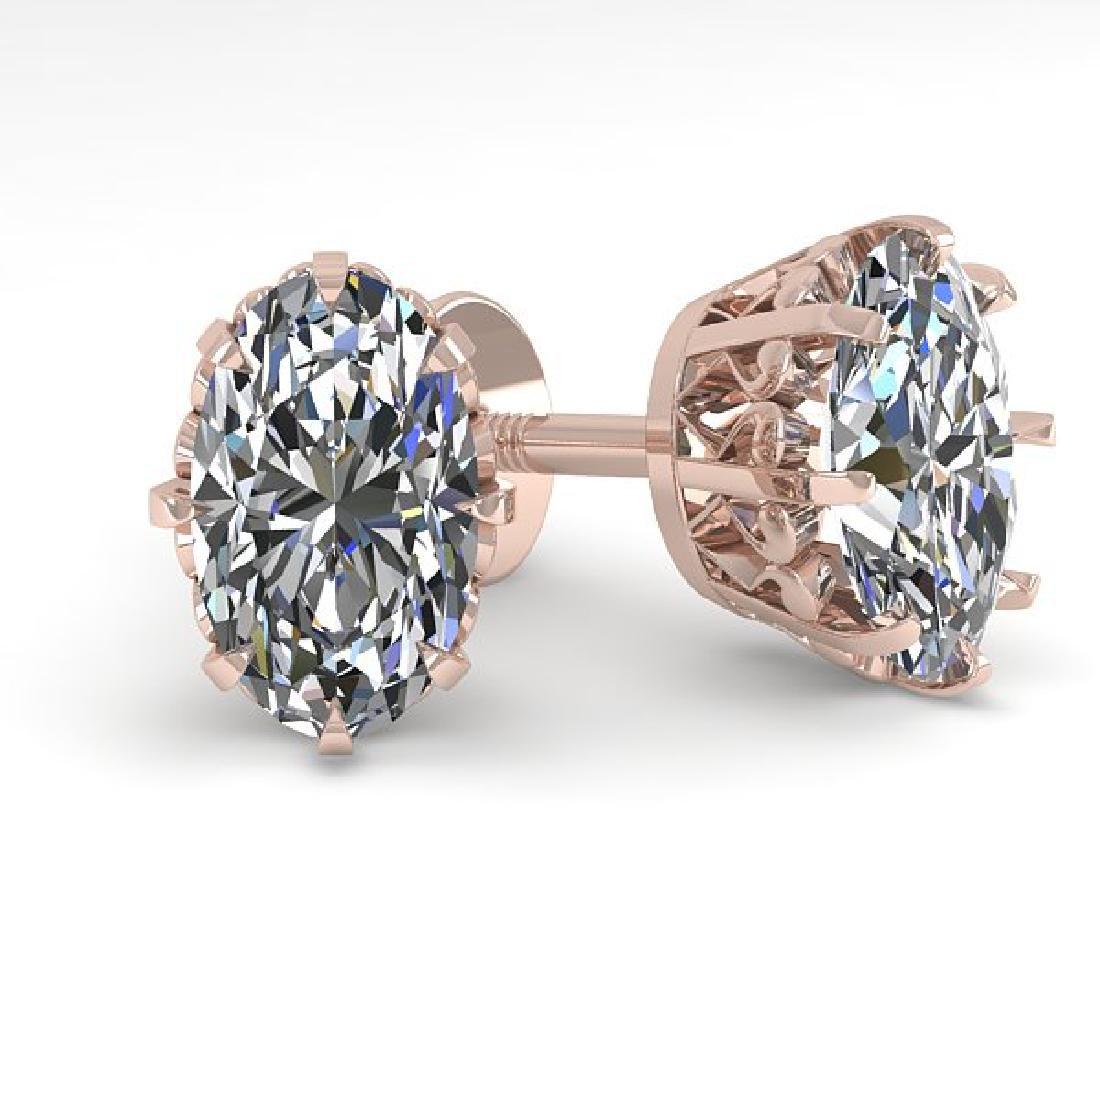 1.0 CTW VS/SI Oval Cut Diamond Stud Solitaire Earrings